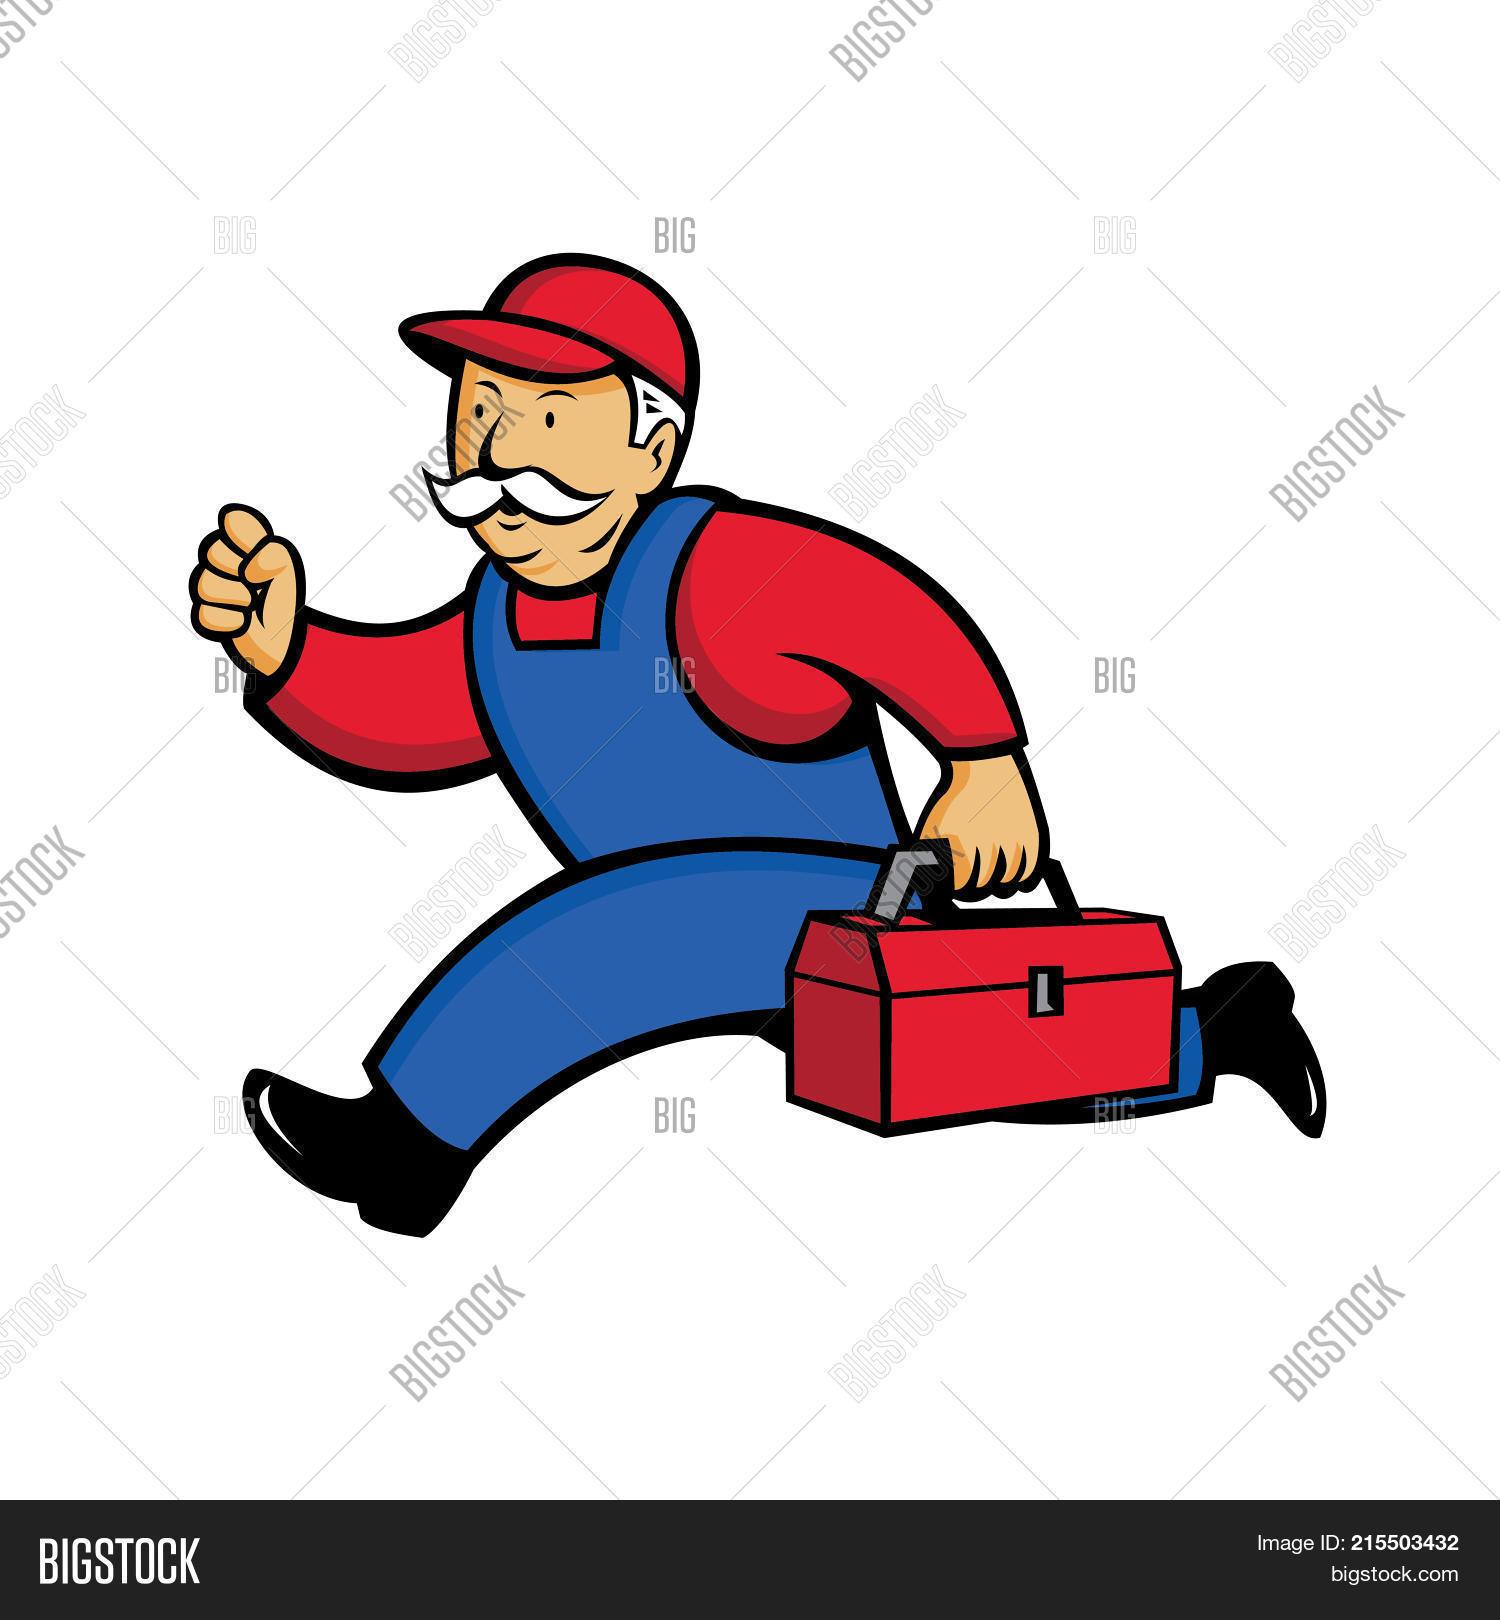 Air,Conditioning,Service,aircon,artwork,caricature,cartoon,drawing,graphic,hand-drawn,handmade,illustration,ink,line,mechanic,refrigeration,repairman,running,sketch,technician,toolbox